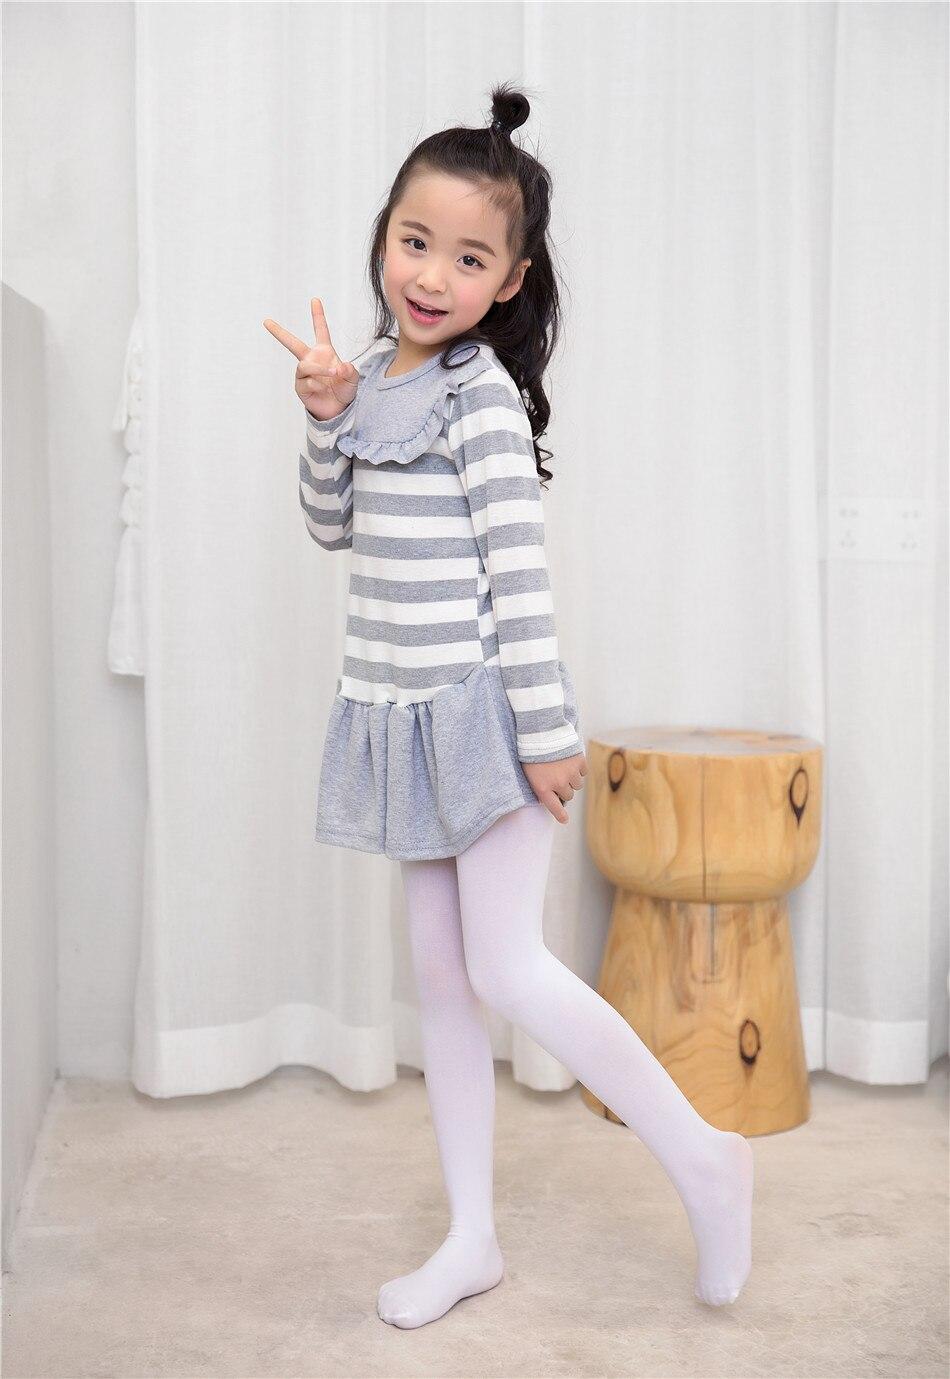 little girl pantyhose models Depositphotos